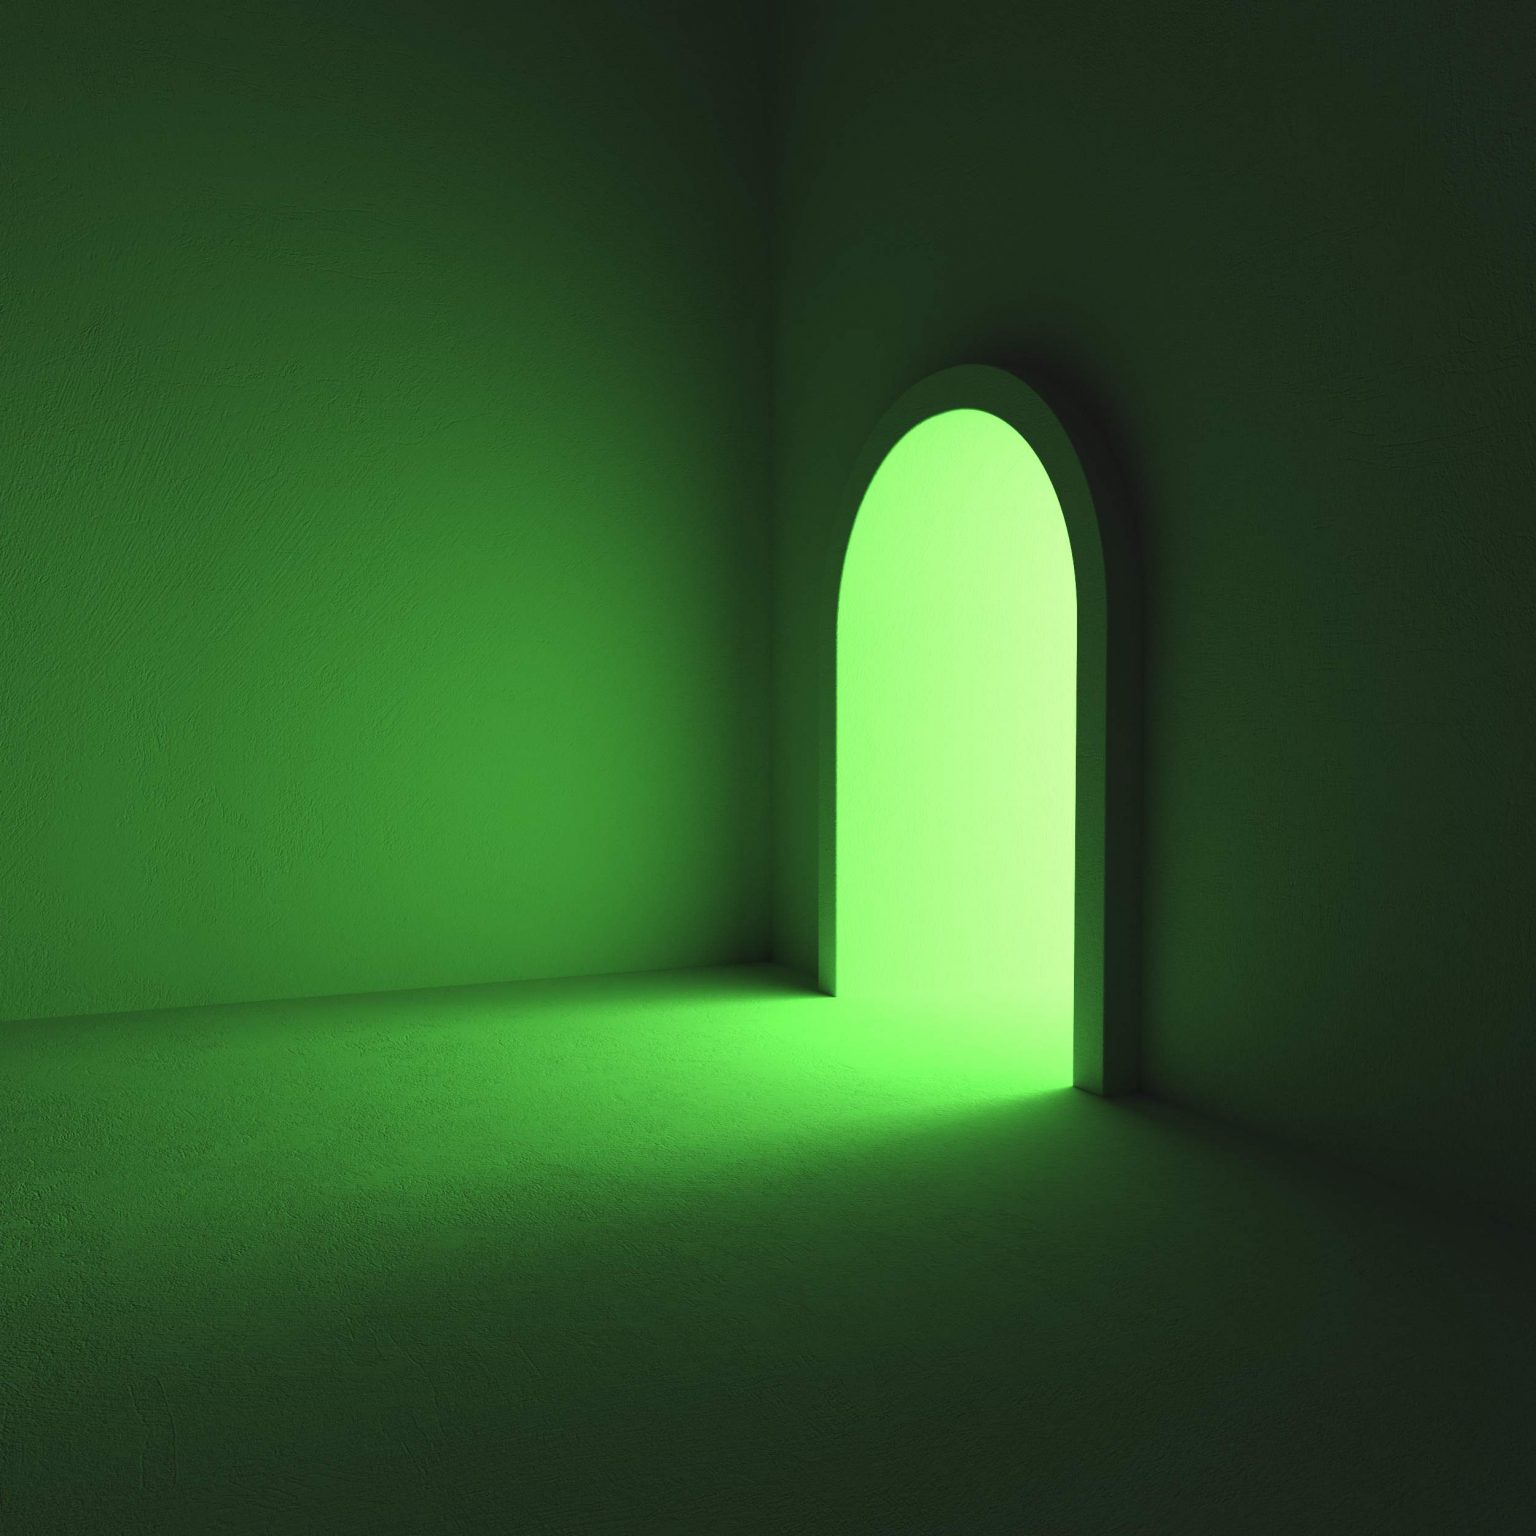 Niklas Beab Green Room 3D Design